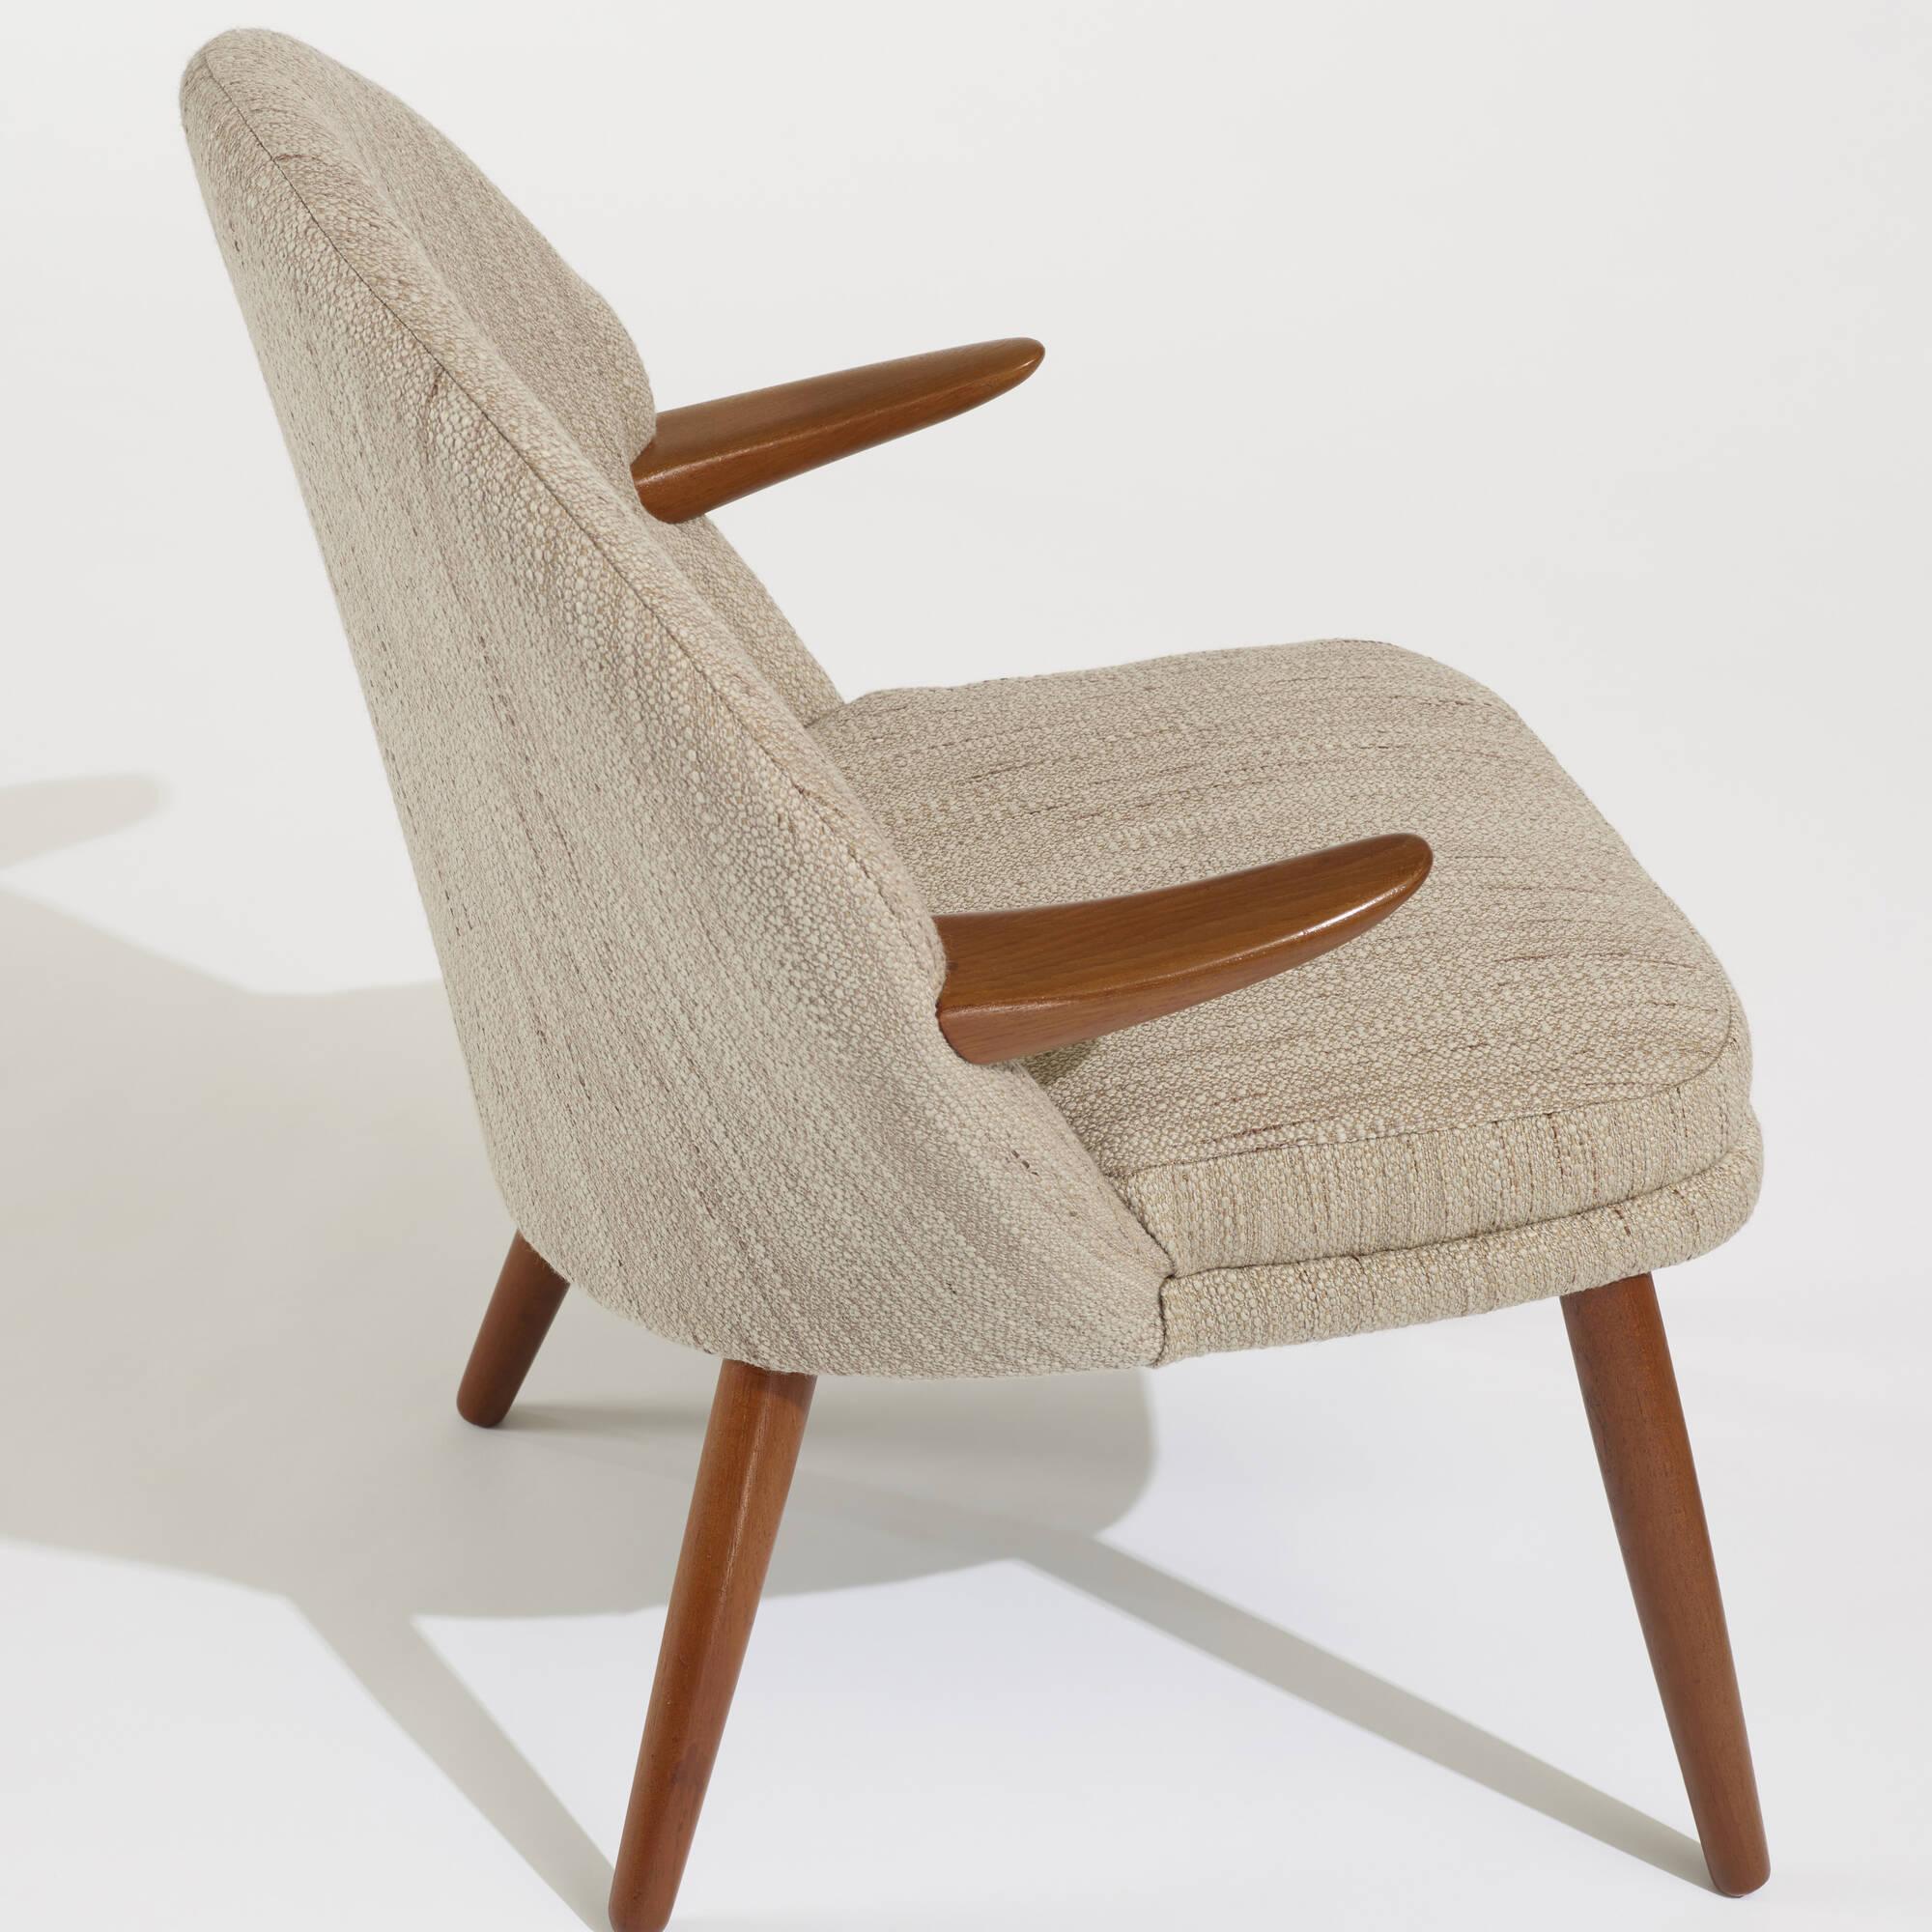 140: Kurt Olsen / lounge chairs, pair (3 of 3)